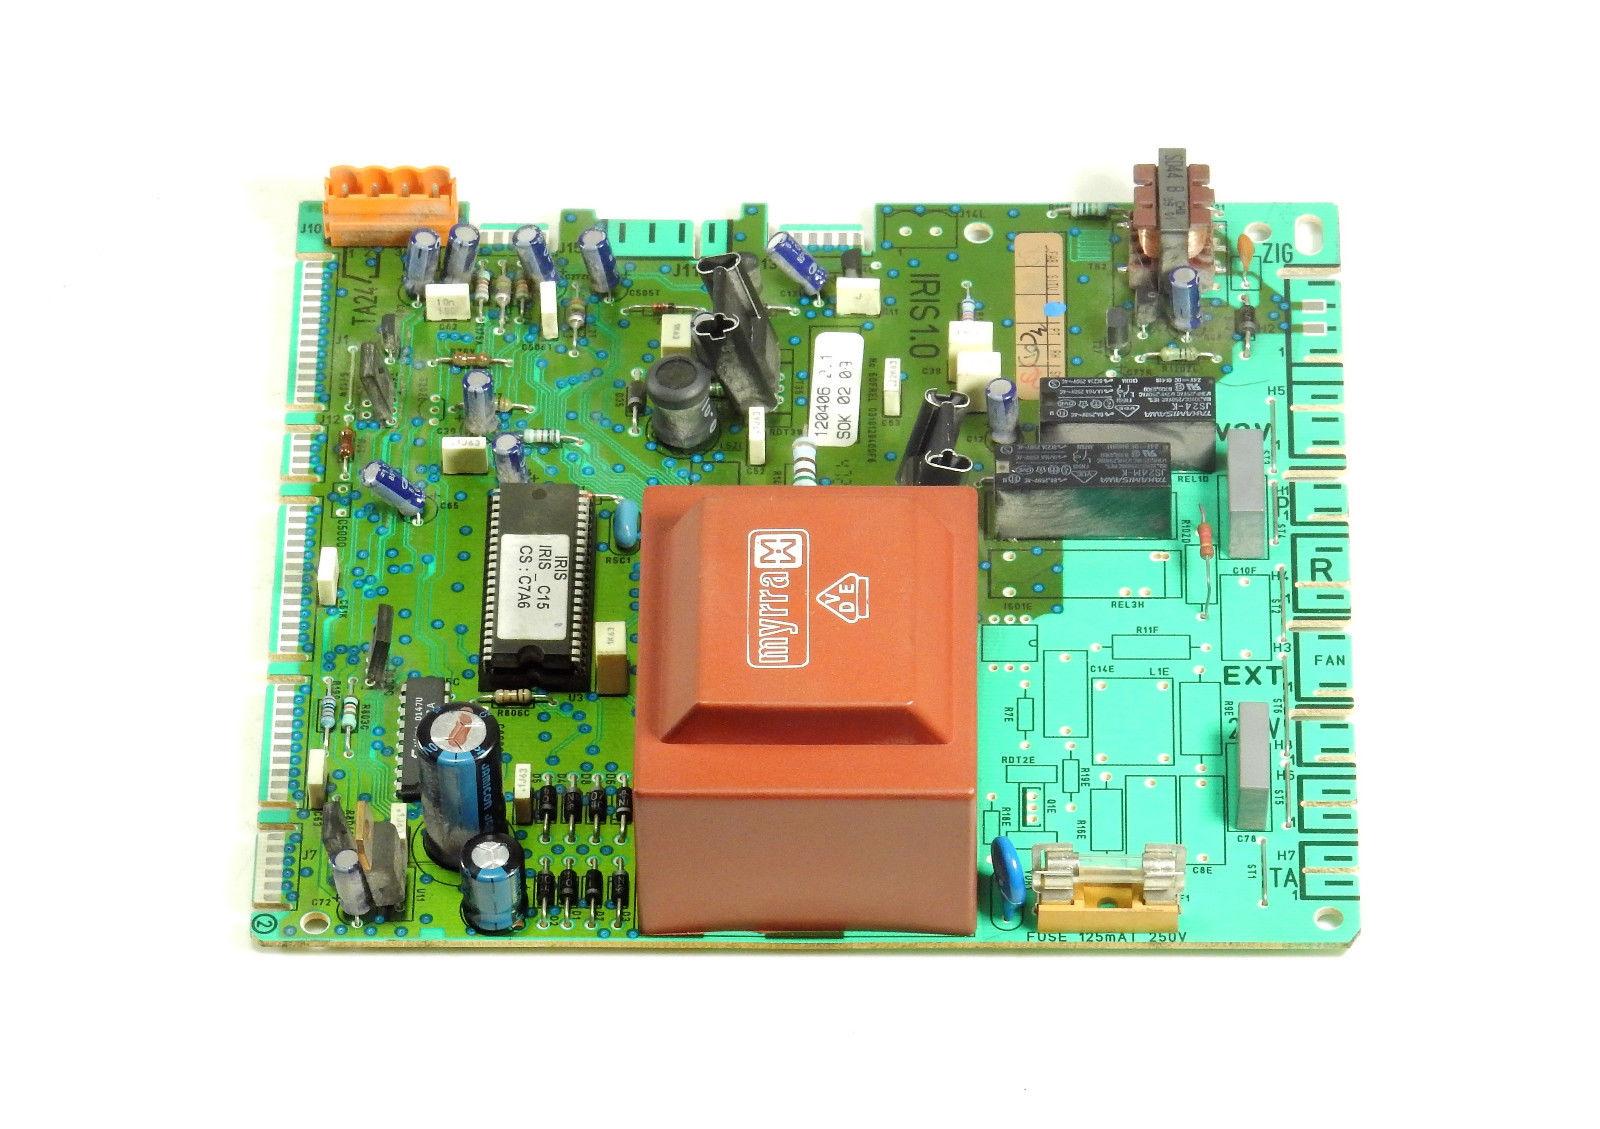 GLOWWORM 24CXI / 30CXI / 38CXI / 18SXI / 30SXI PCB 2000802731 was ...